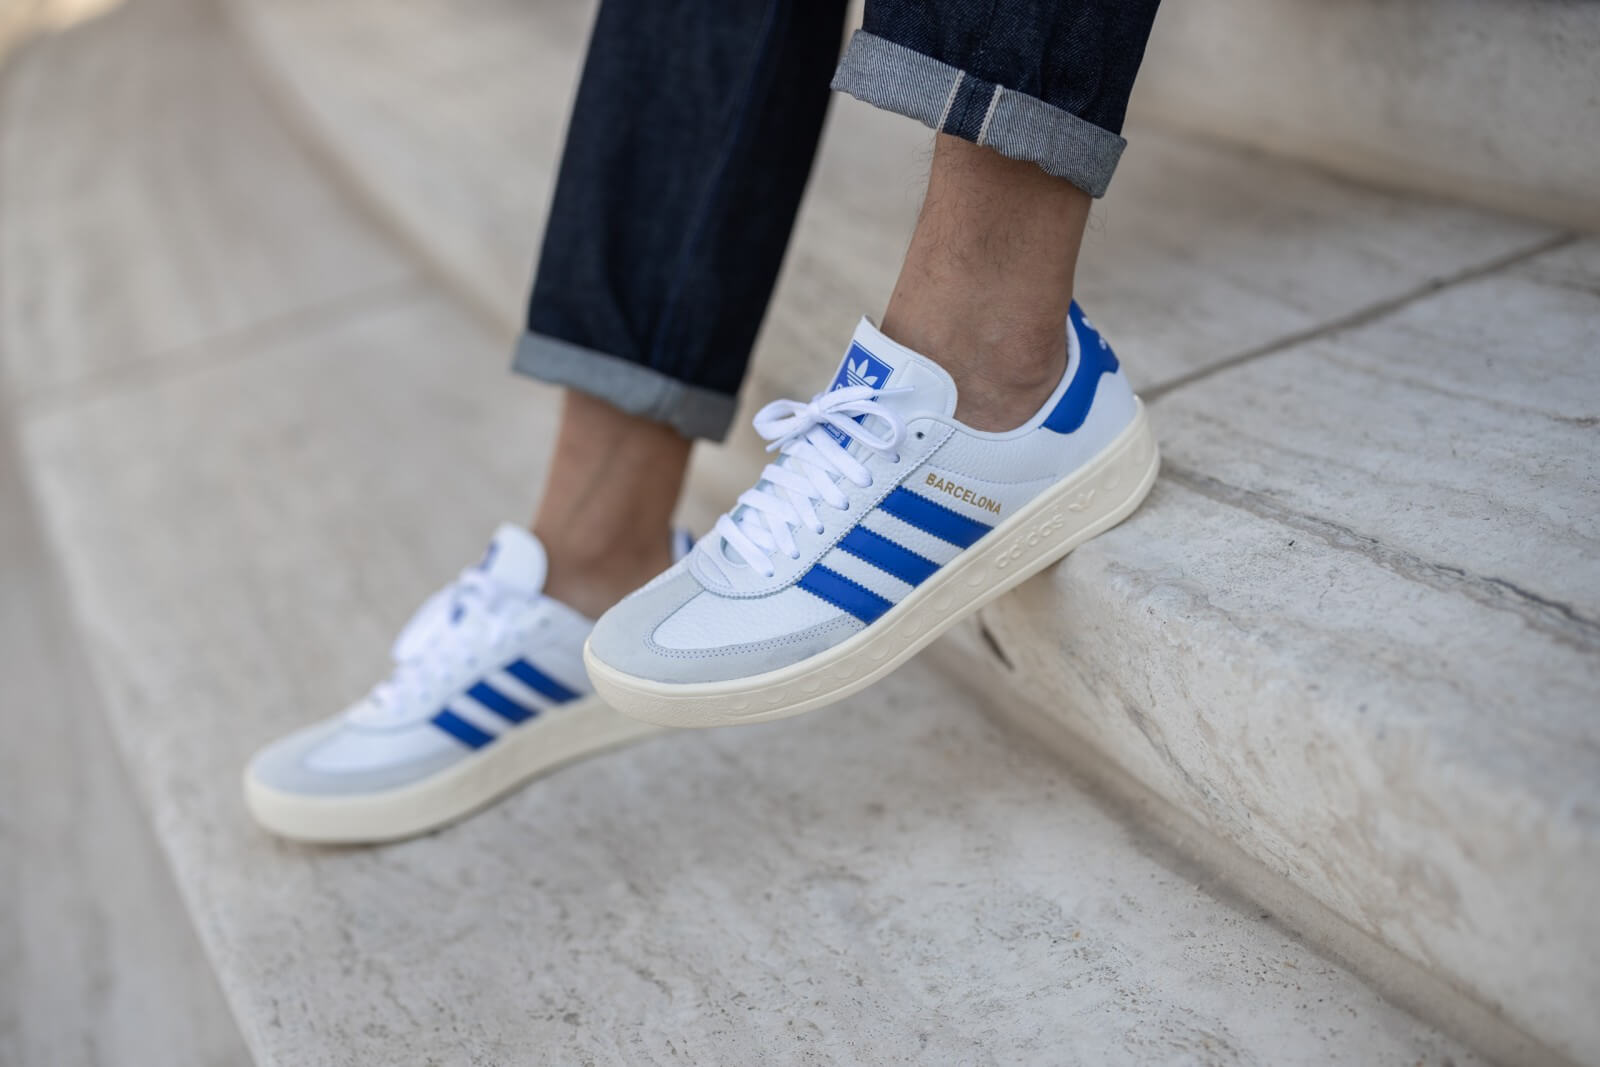 Adidas City Series Barcelona Cloud White/Blue-Cream White